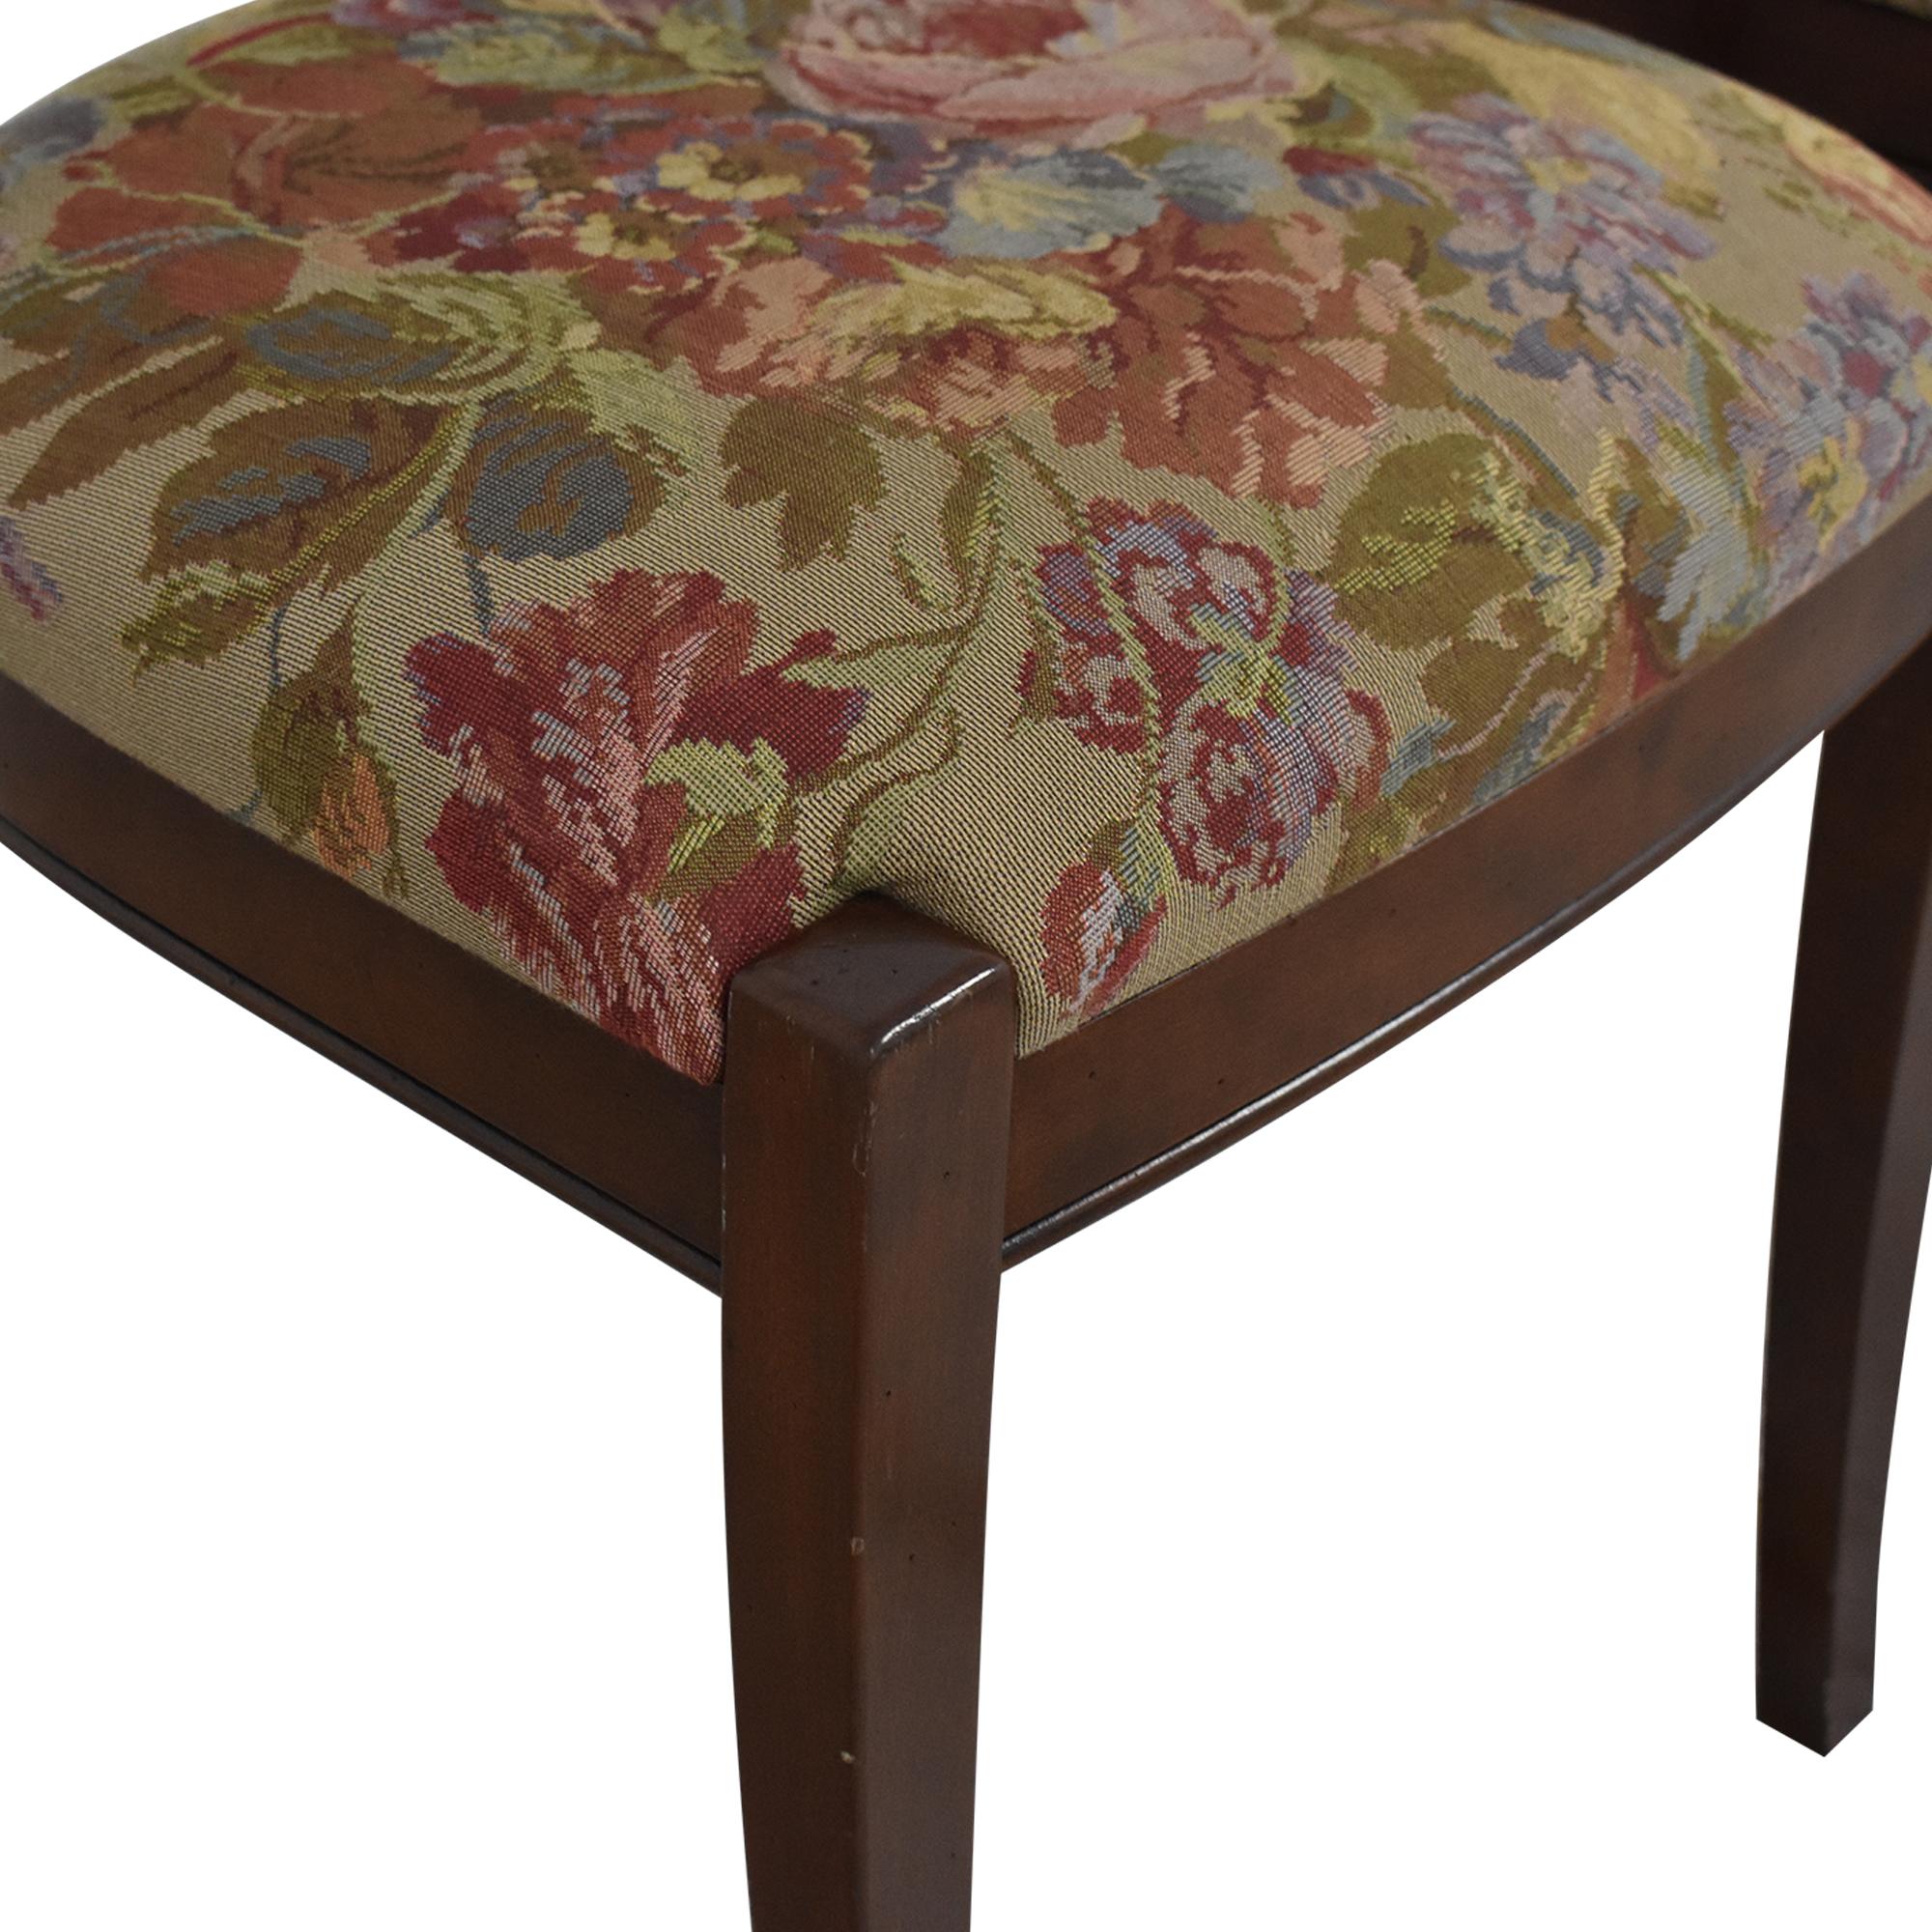 Grange Grange Upholstered Dining Chairs on sale